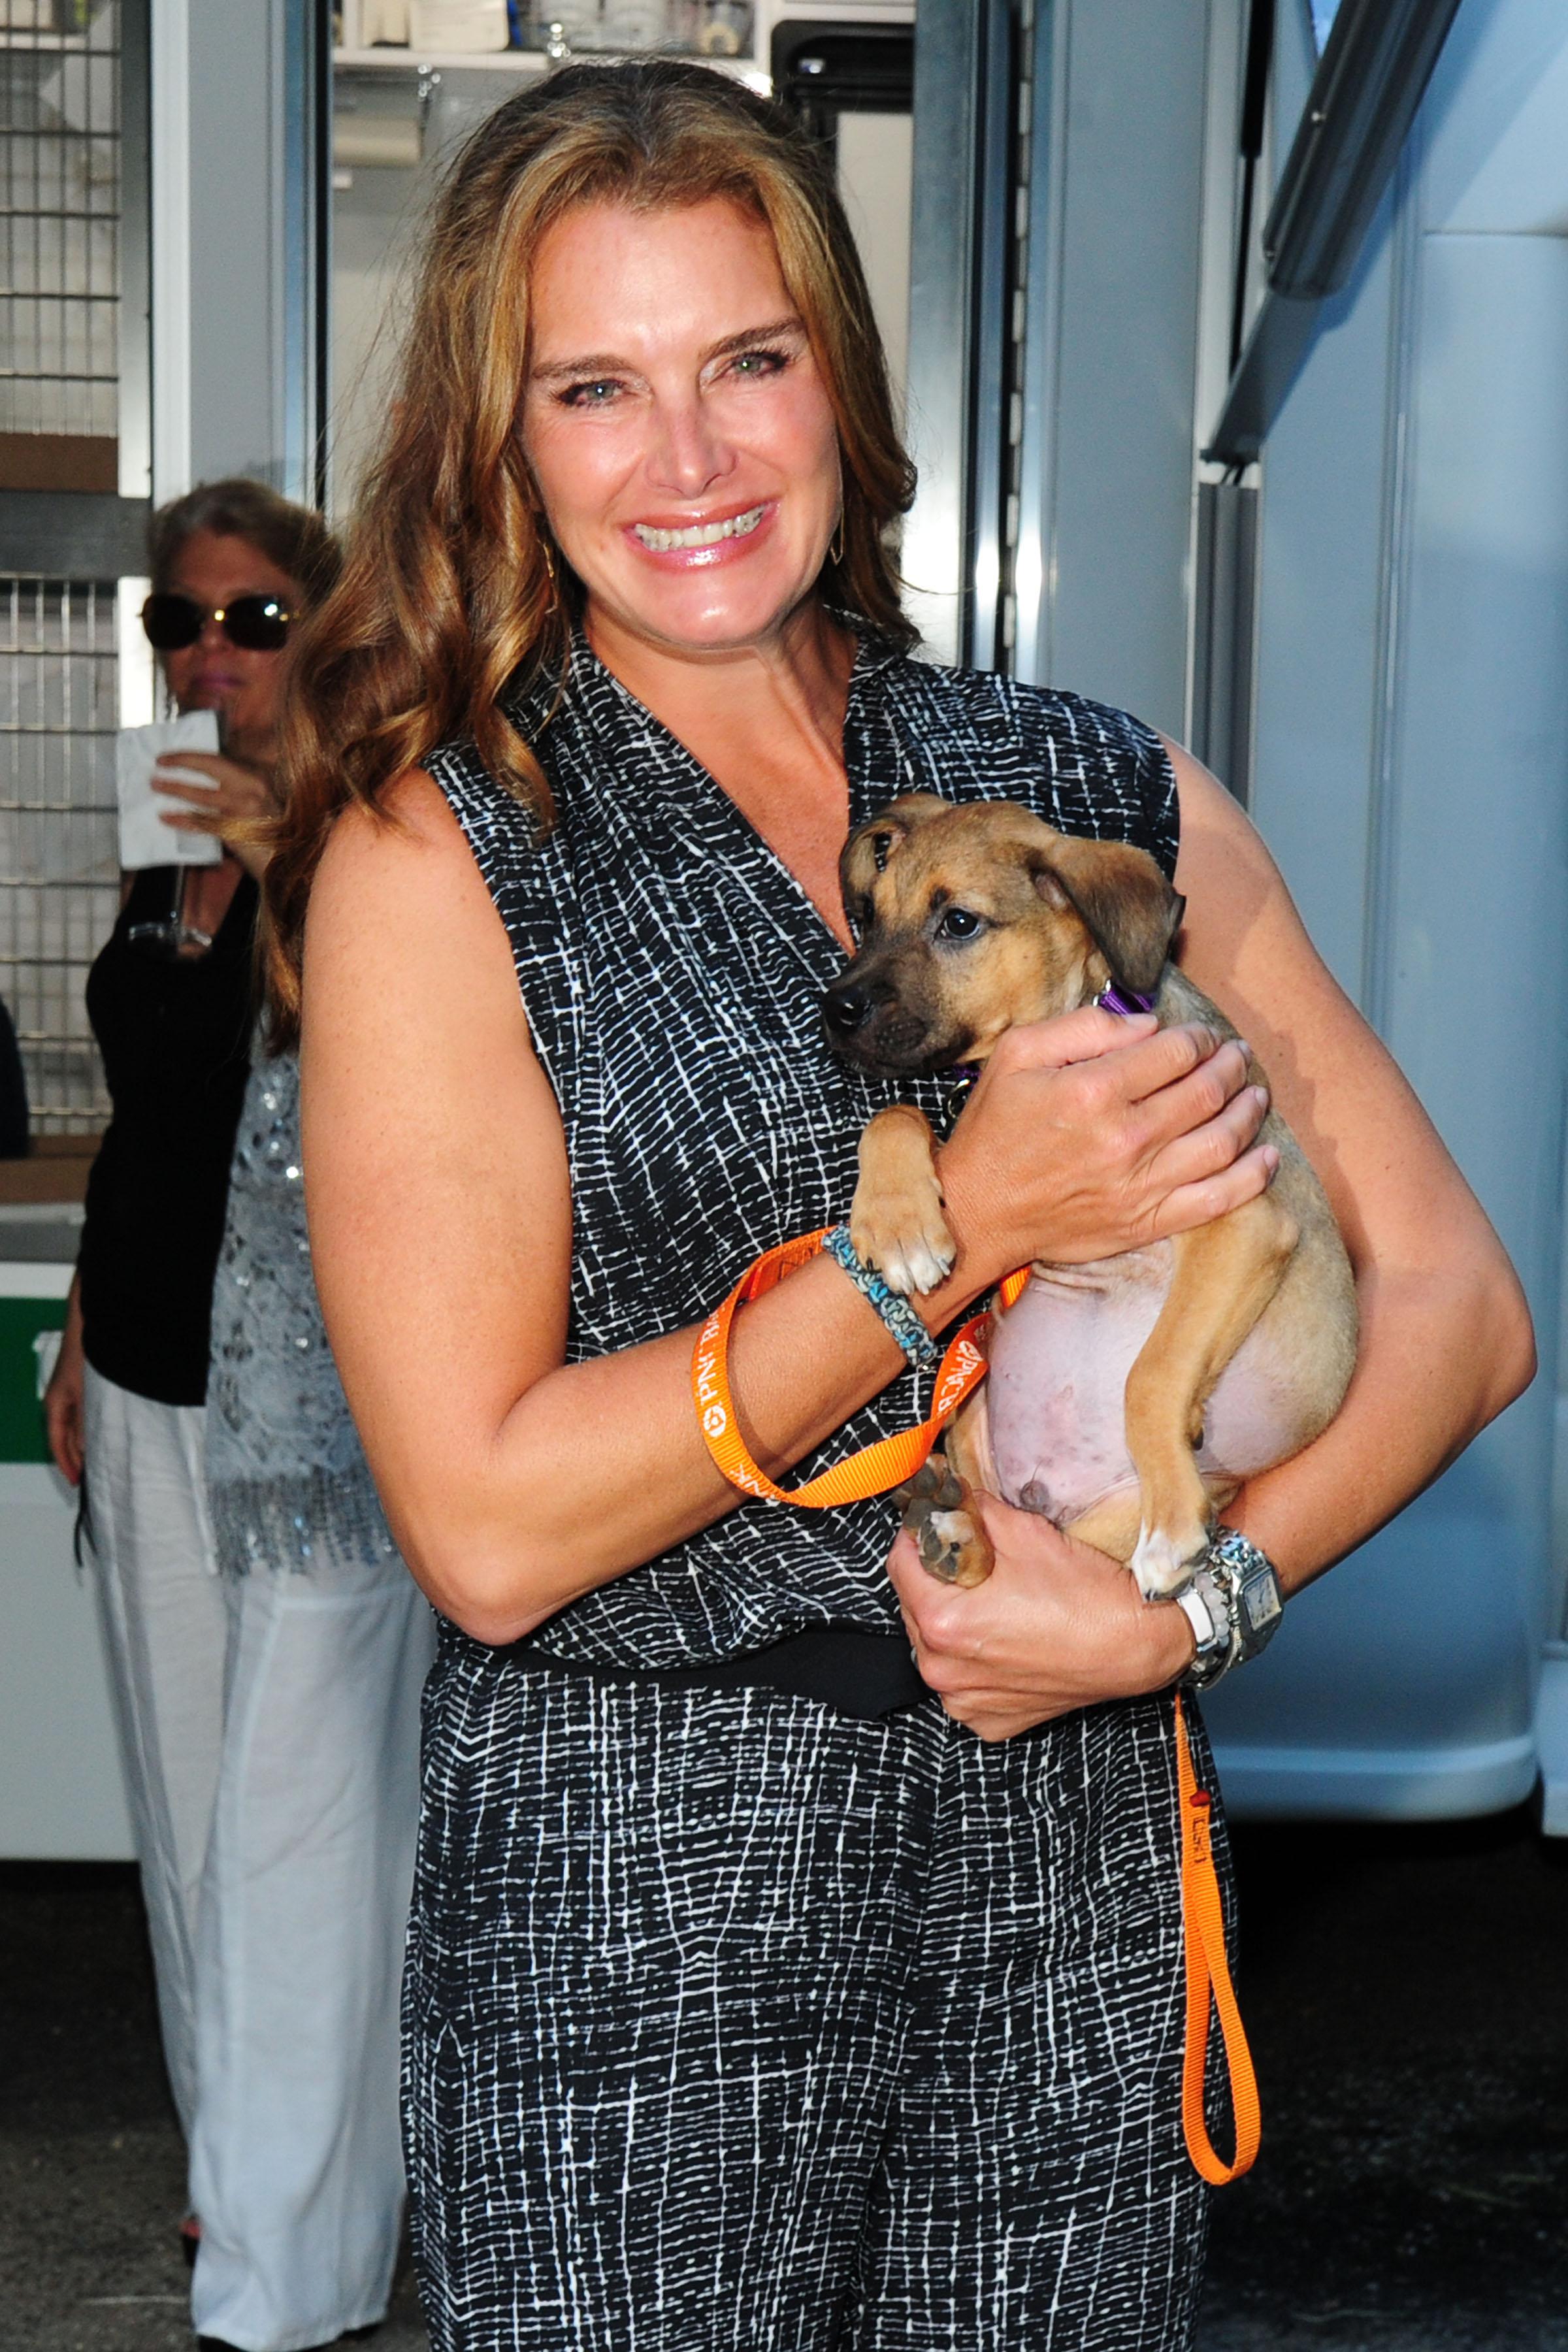 Emcee Brooke Shields holds an adorable pup (credit: owen hoffmann/patrickmcmullan.com)